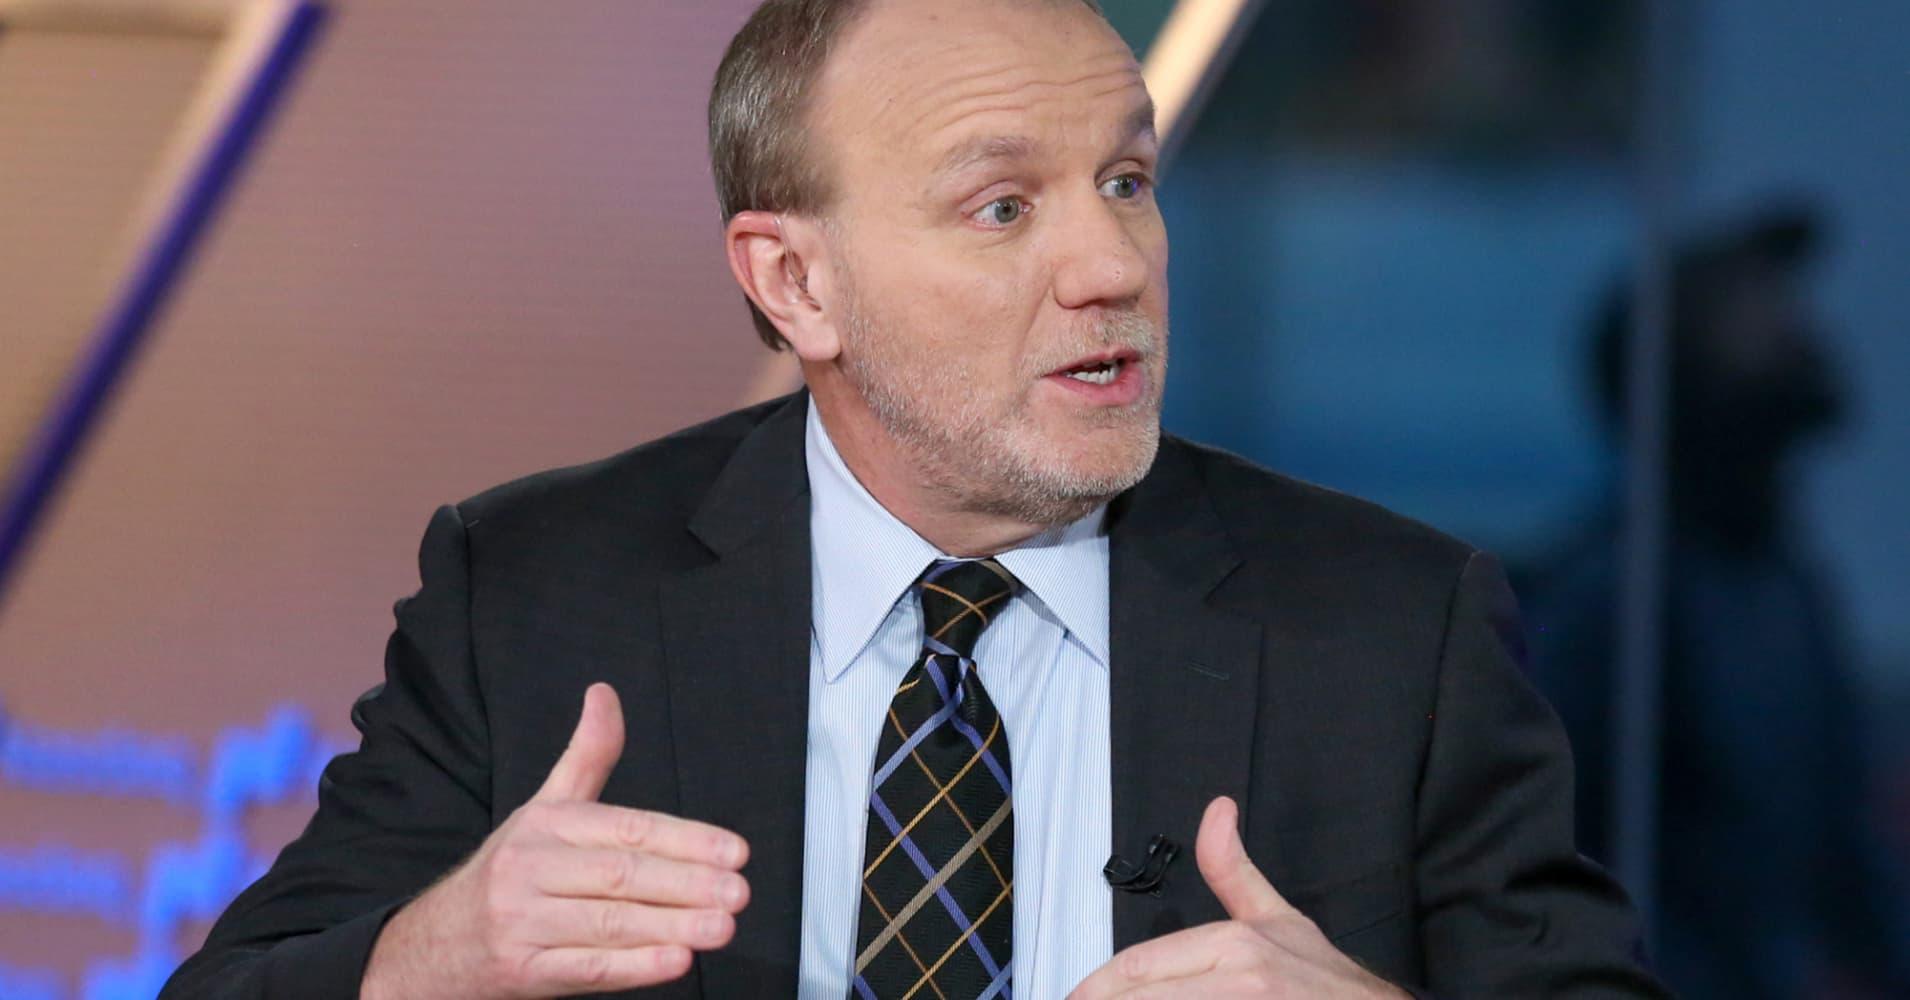 Recession fears will spike when the stock market finally bottoms: Wall Street veteran Jim Paulsen